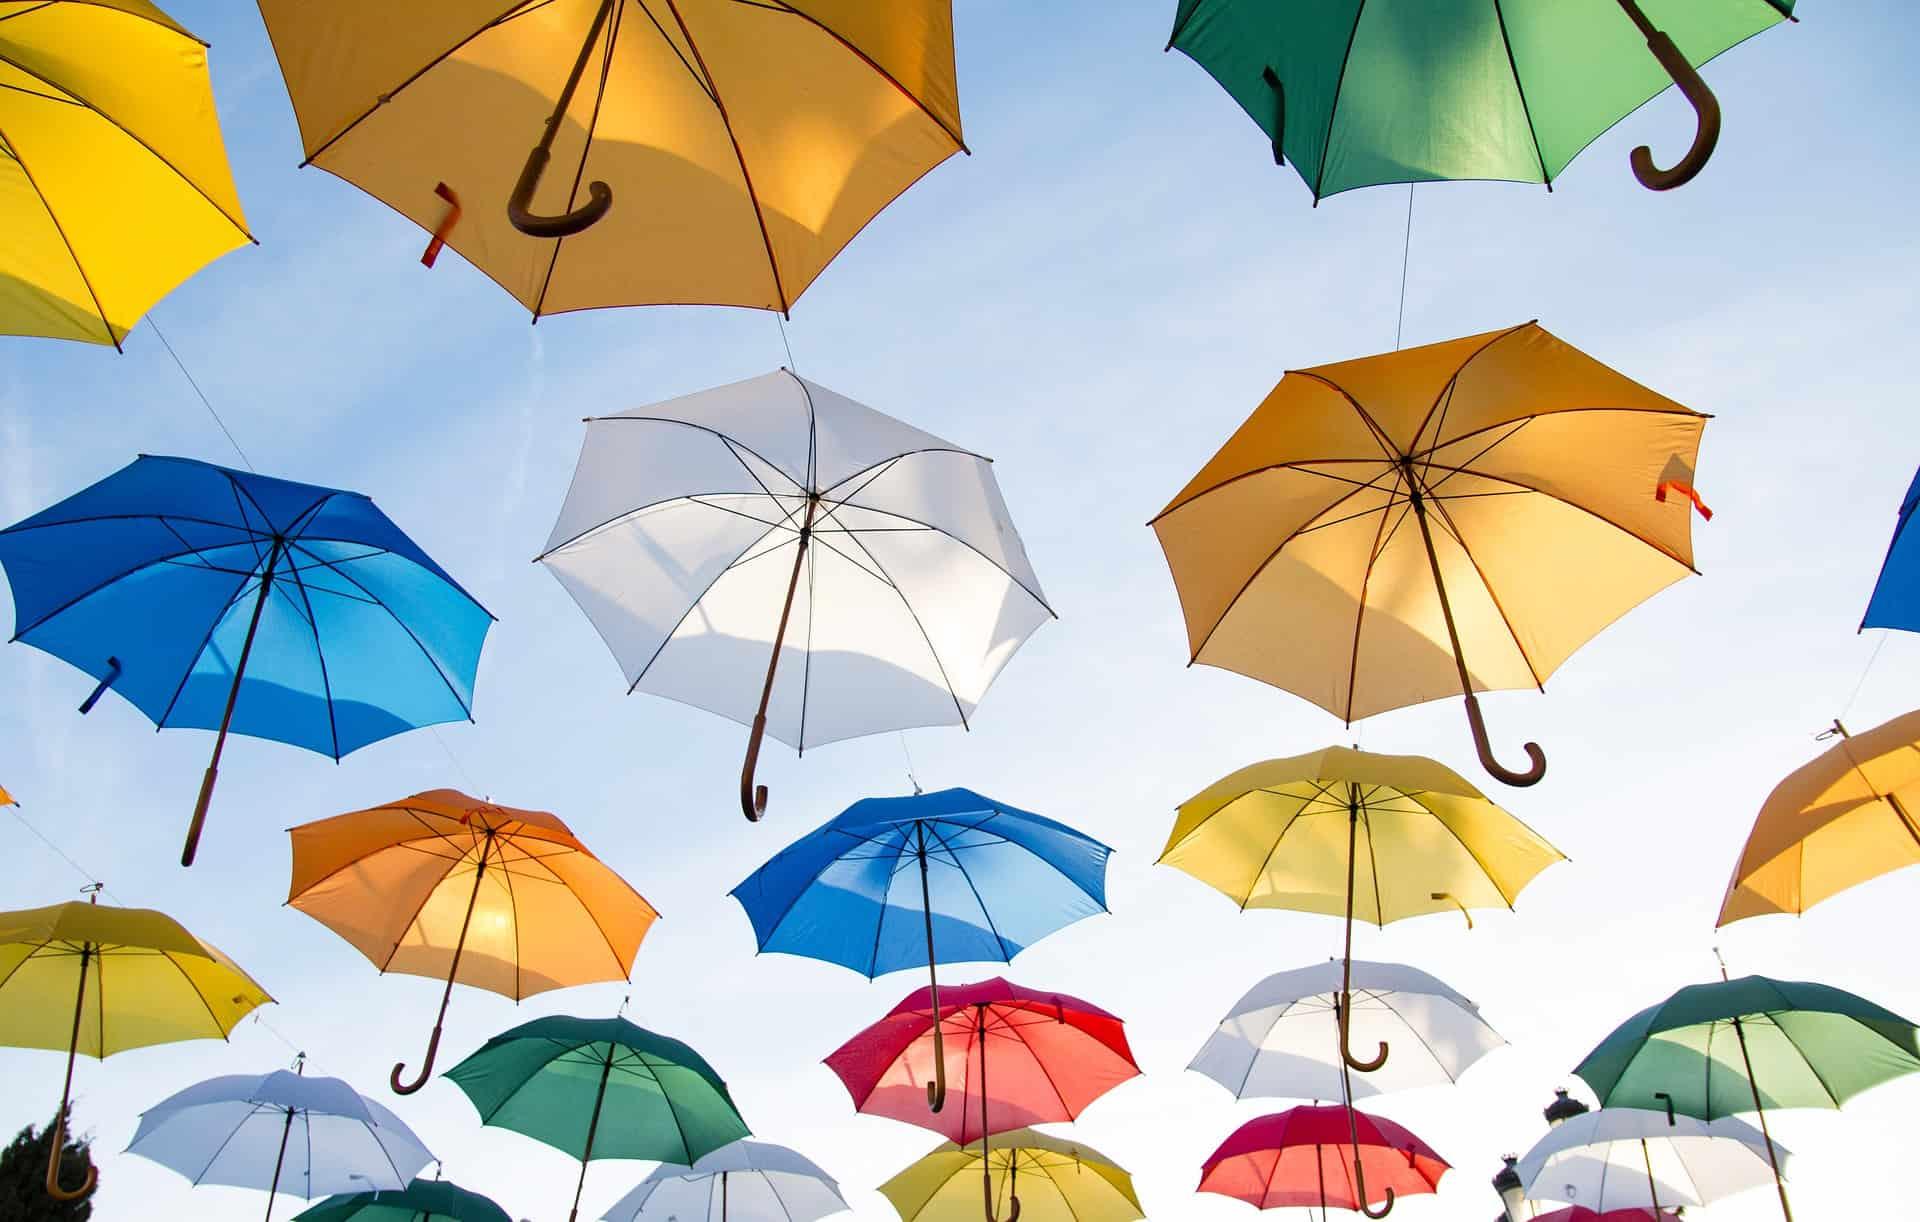 Imagem mostra alguns guarda-chuvas coloridos abertos.